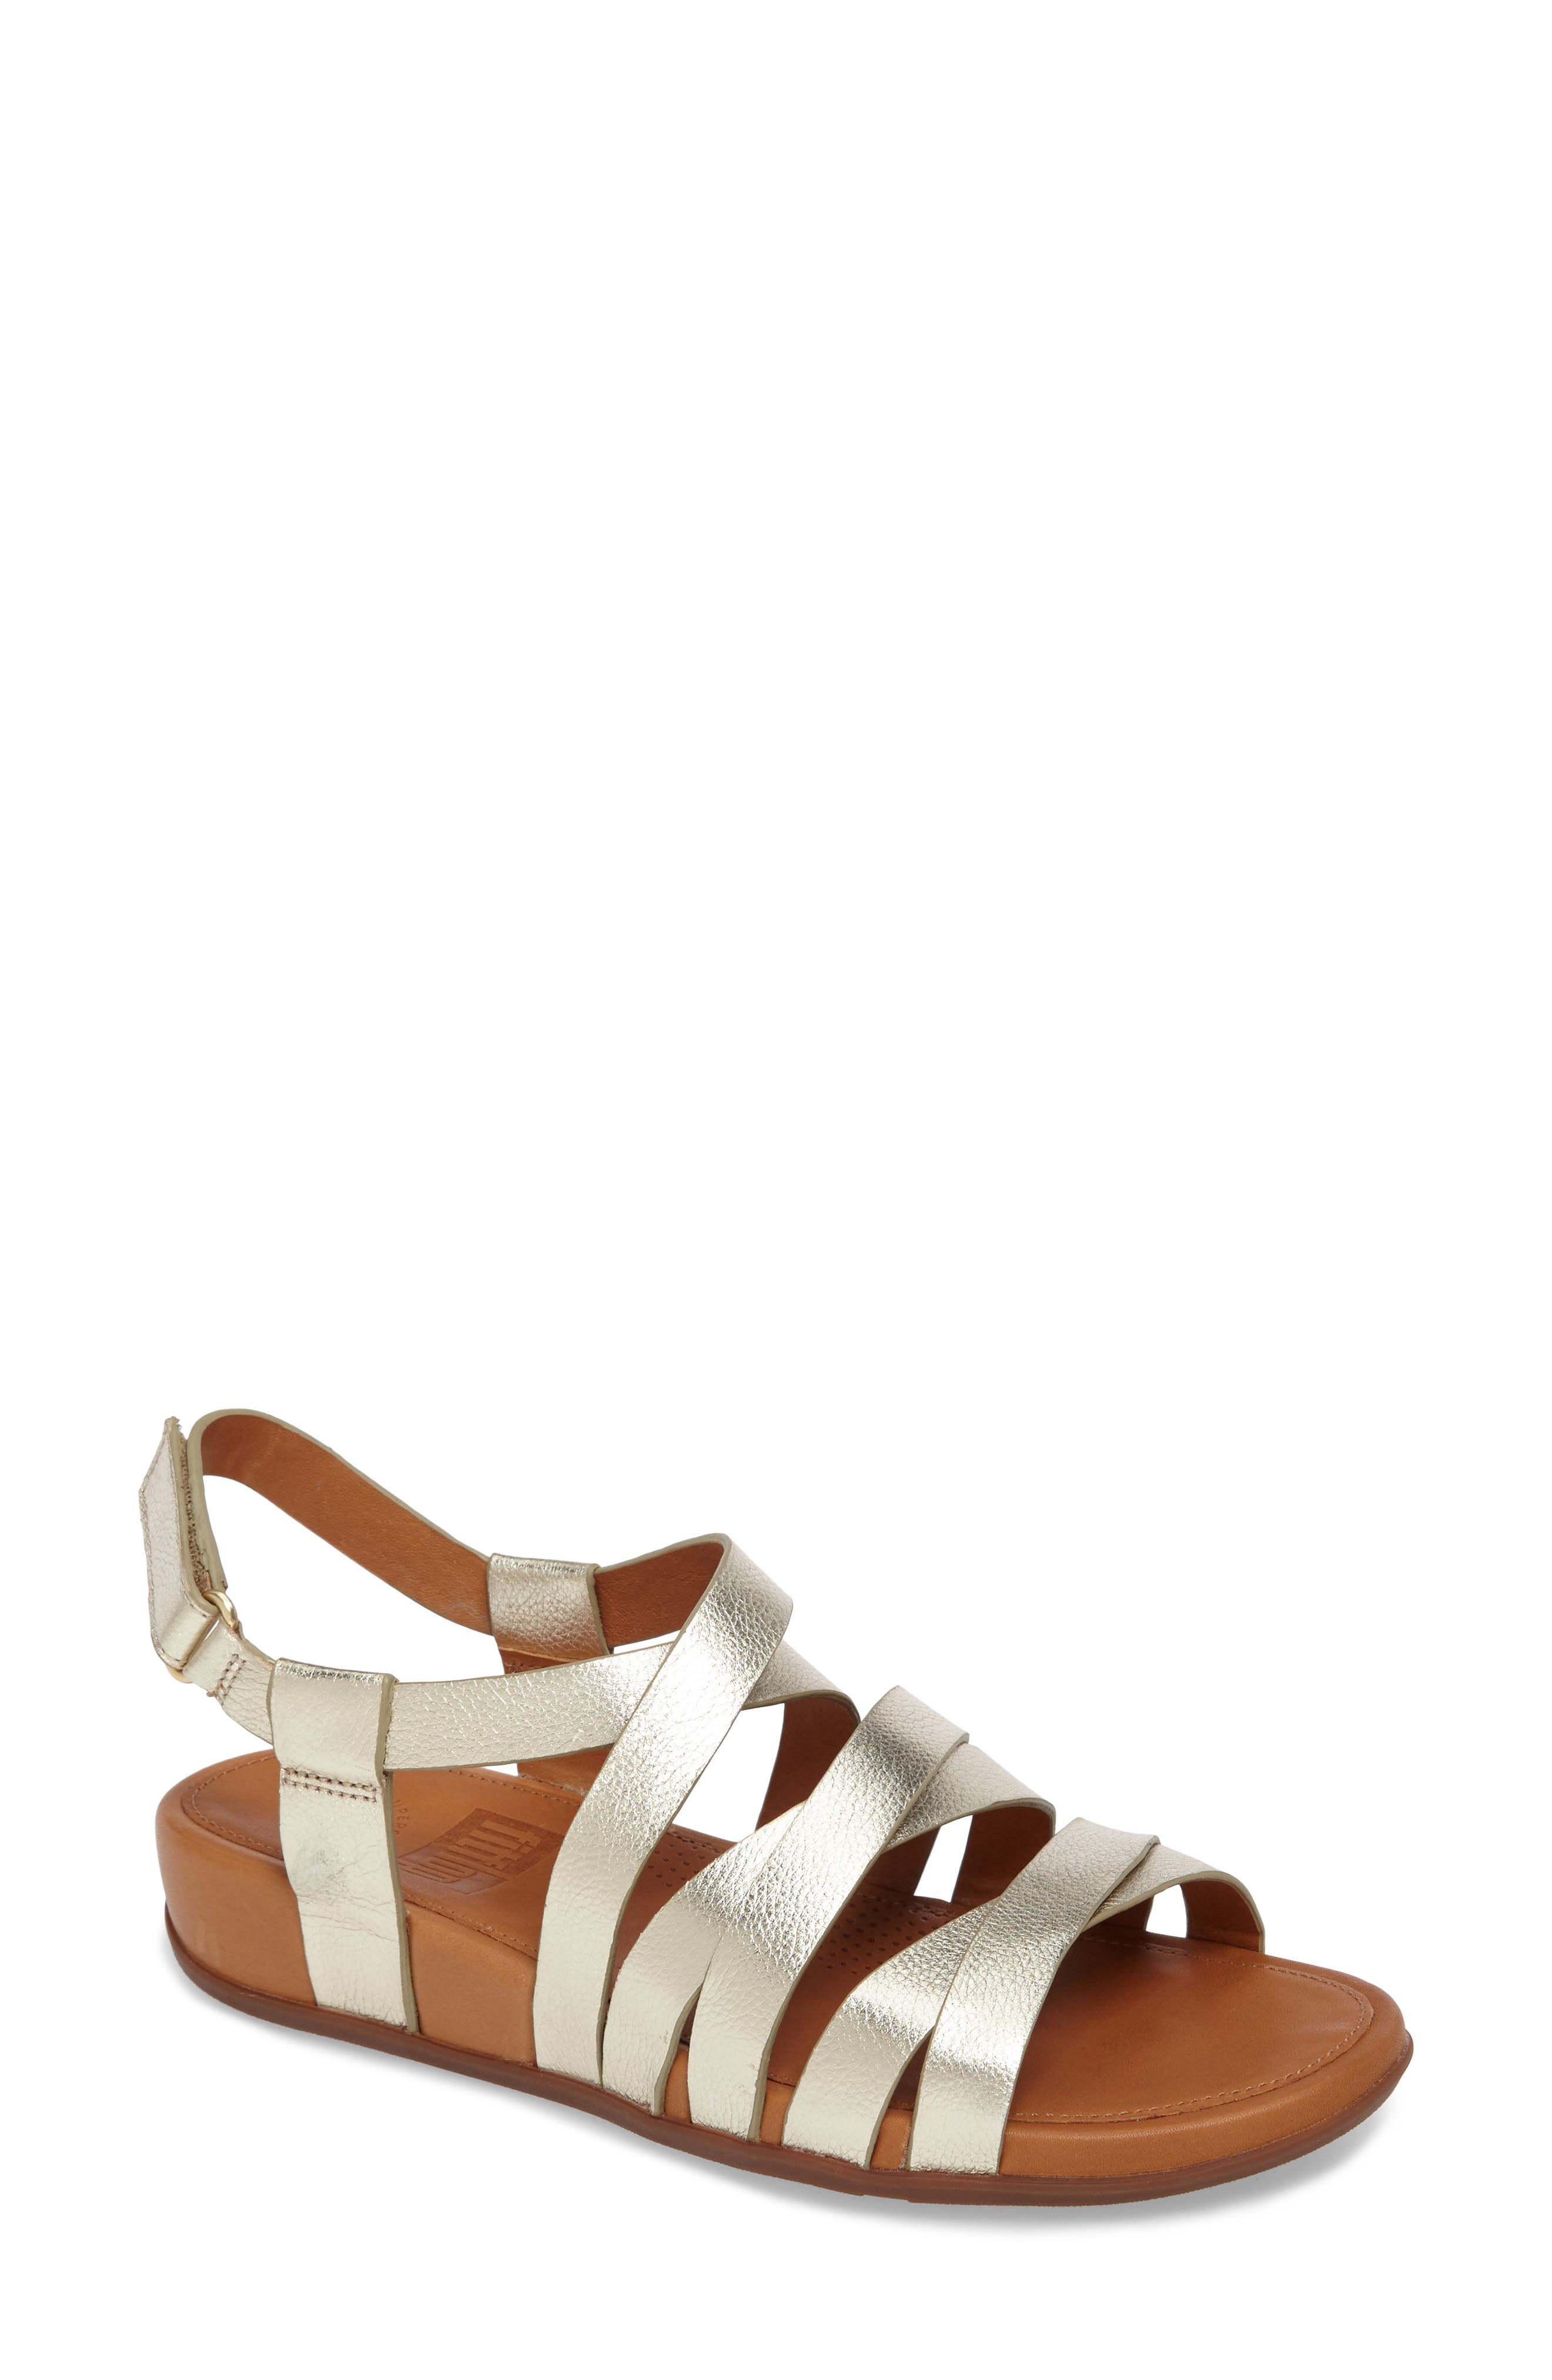 Alternate Image 1 Selected - FitFlop Lumy Gladiator Sandal (Women)